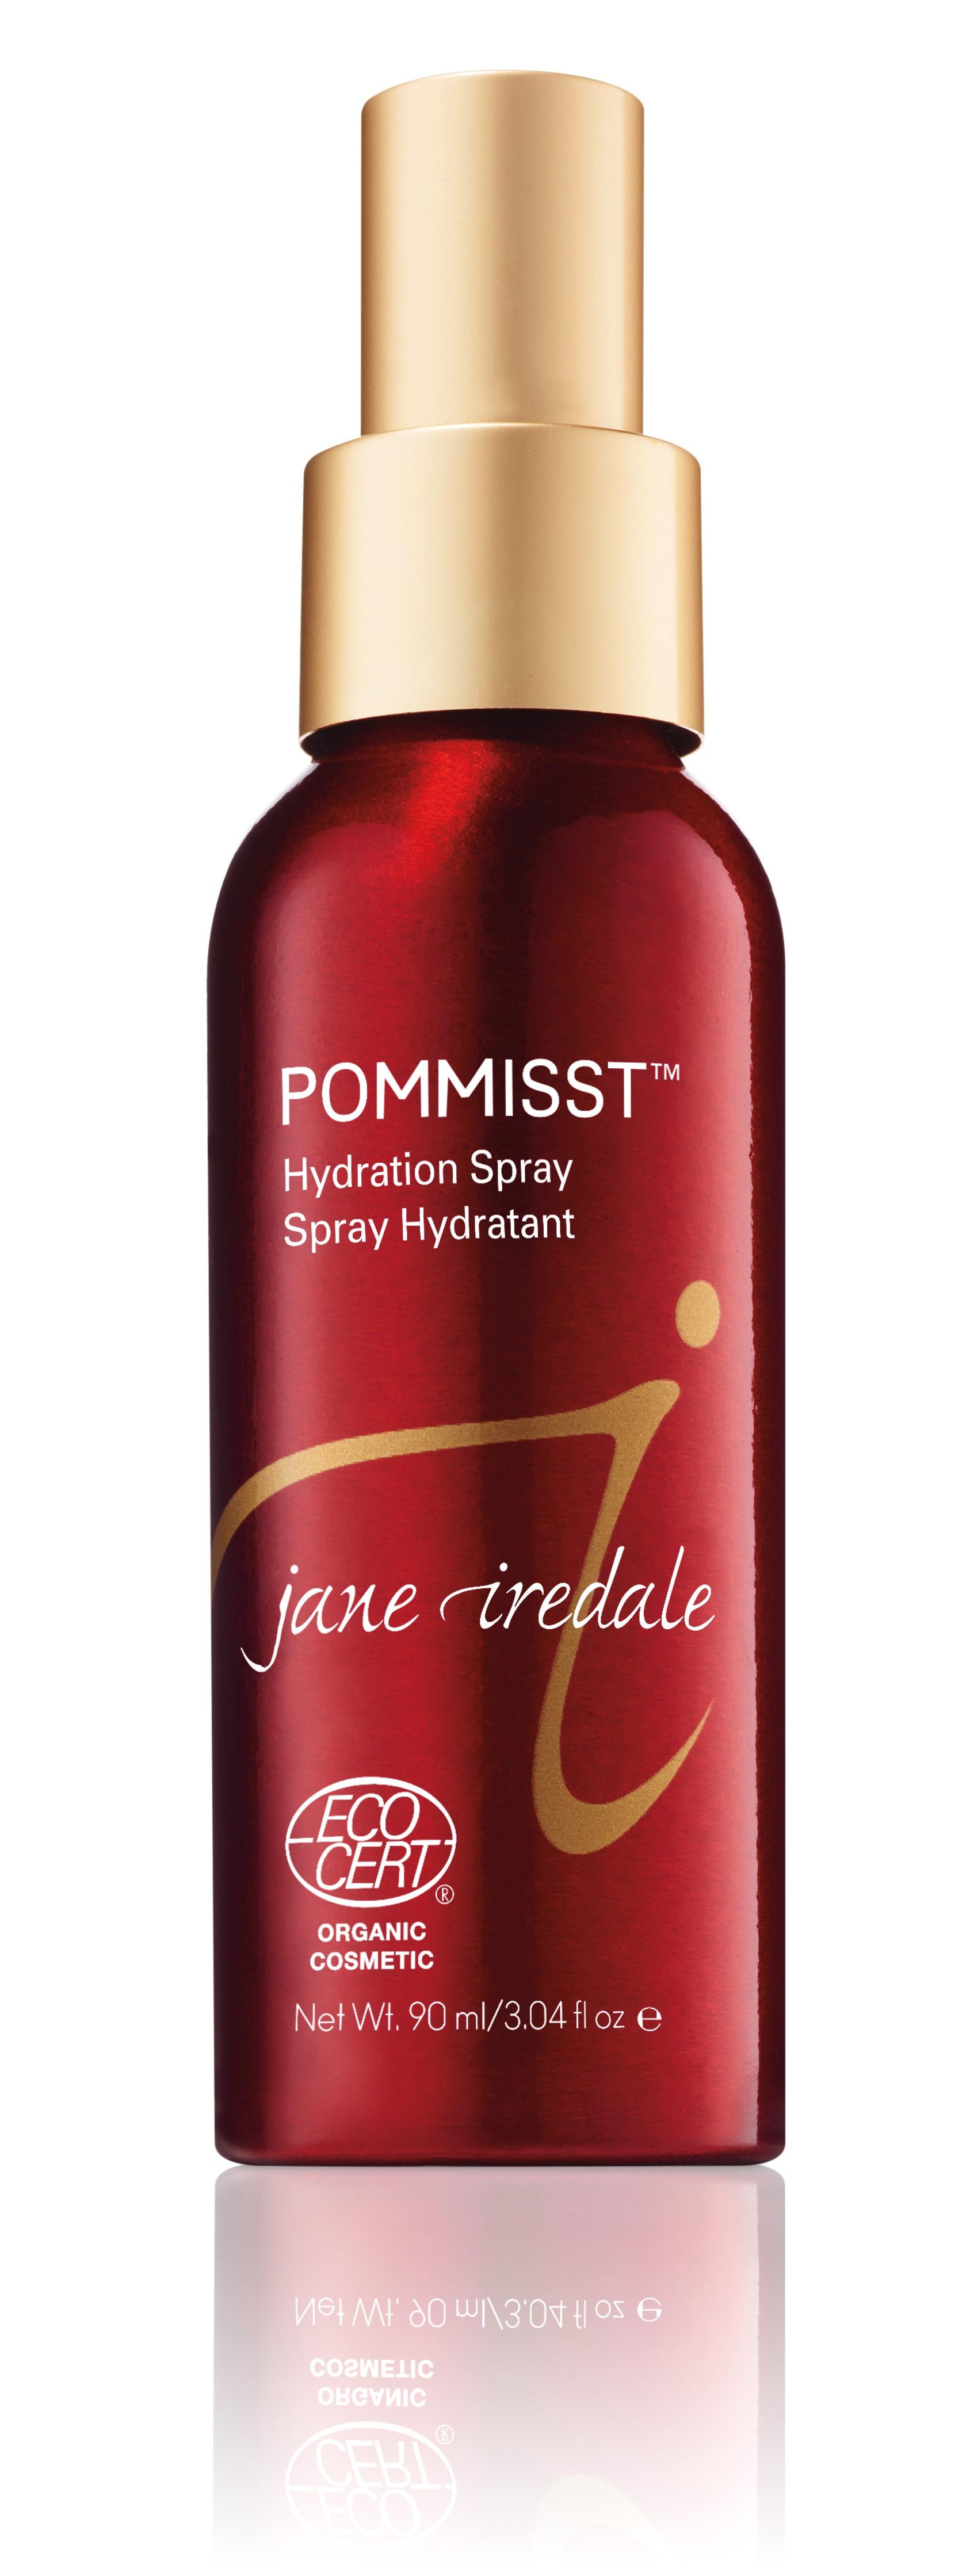 POMMISST---Hydration-Spray-bd.jpg